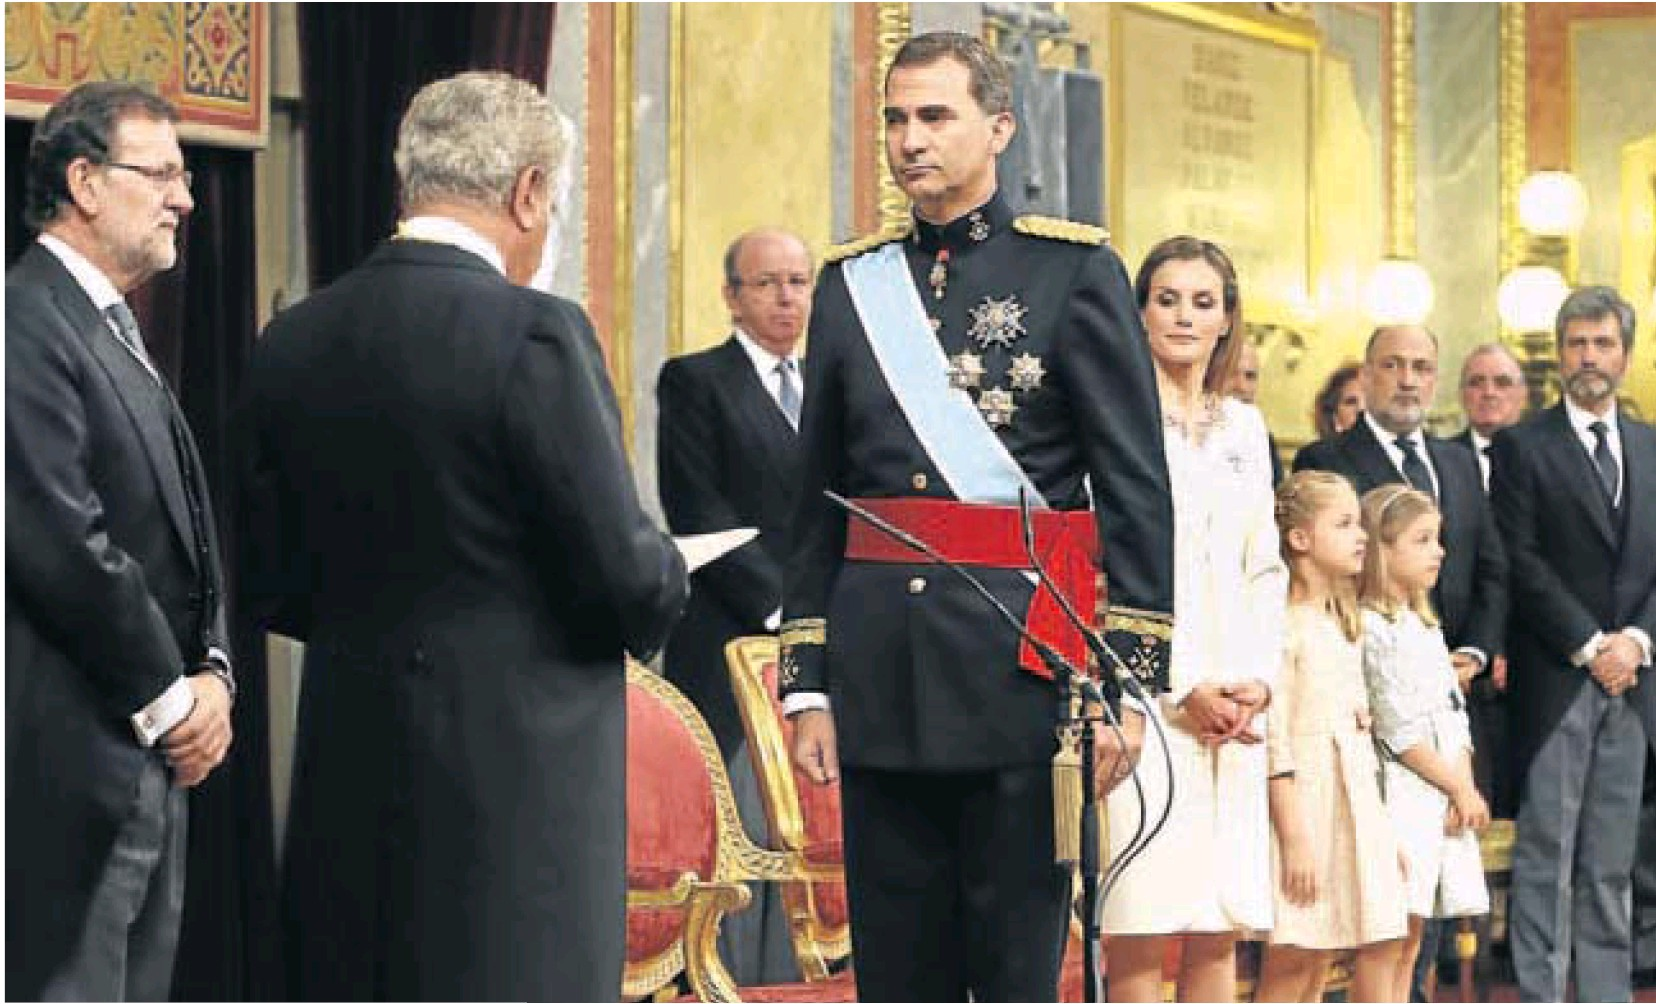 Majestad, no pida permiso para reinar